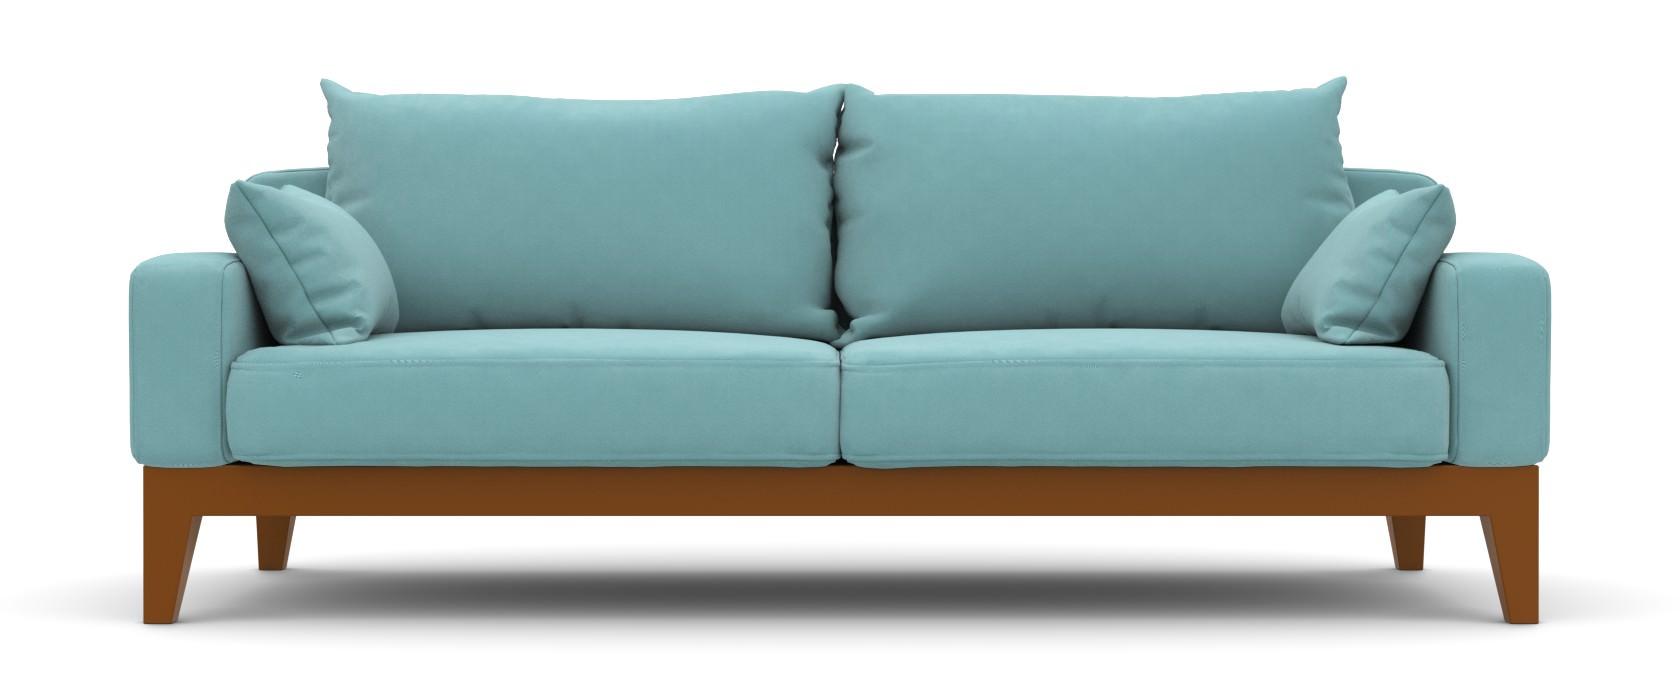 Трехместный диван Antonio